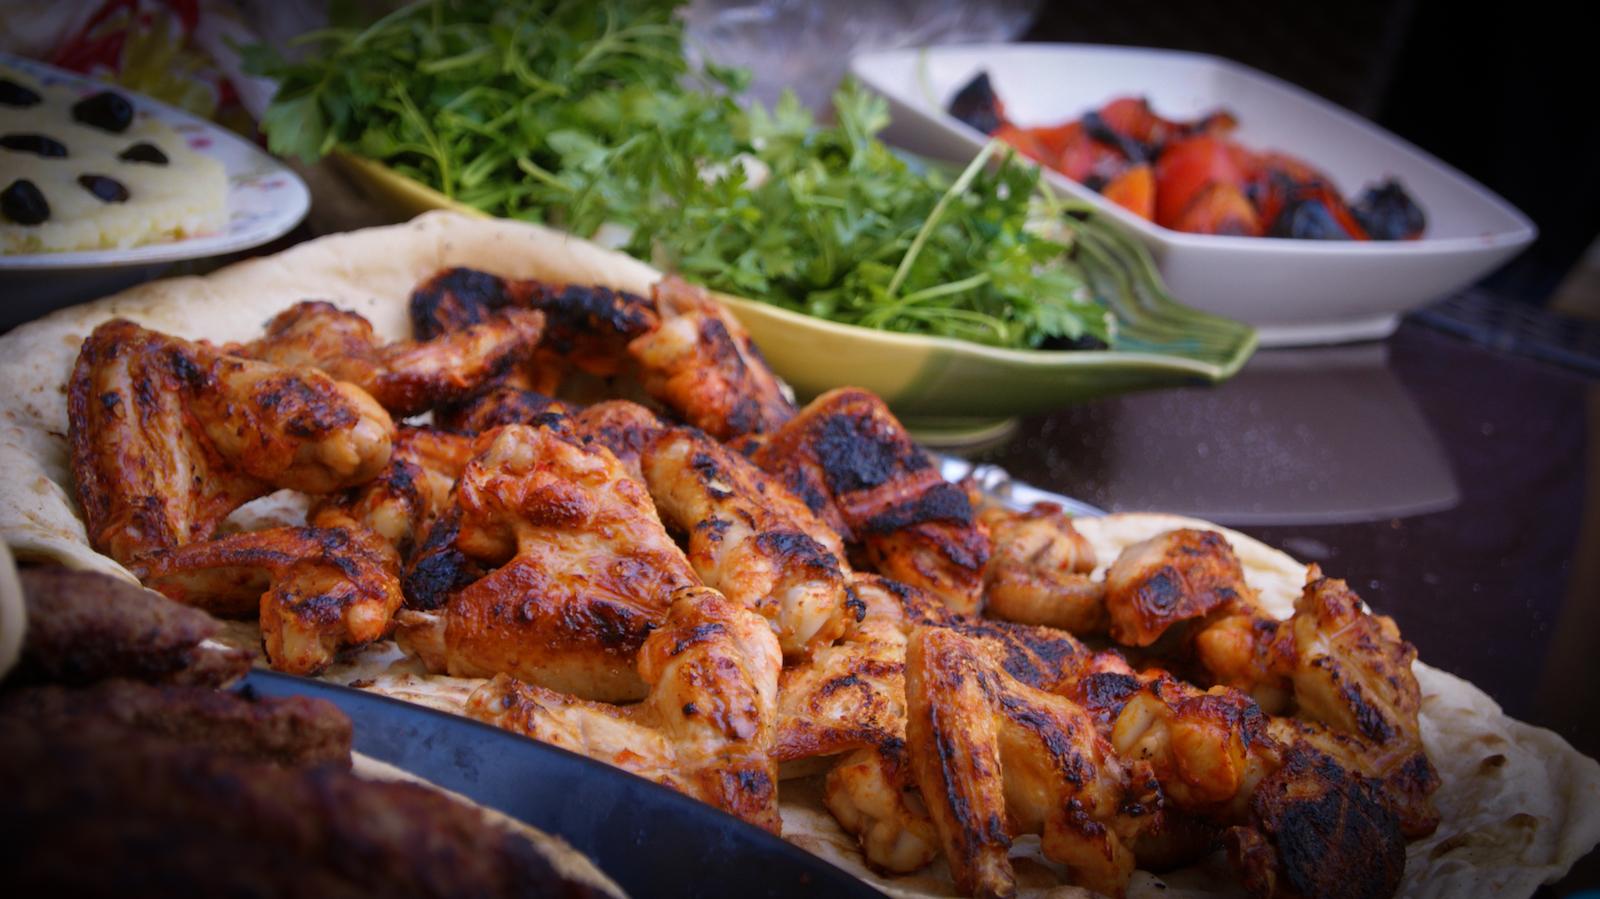 Chicken Wings mit Salat - perfektes ketogenes Abendessen